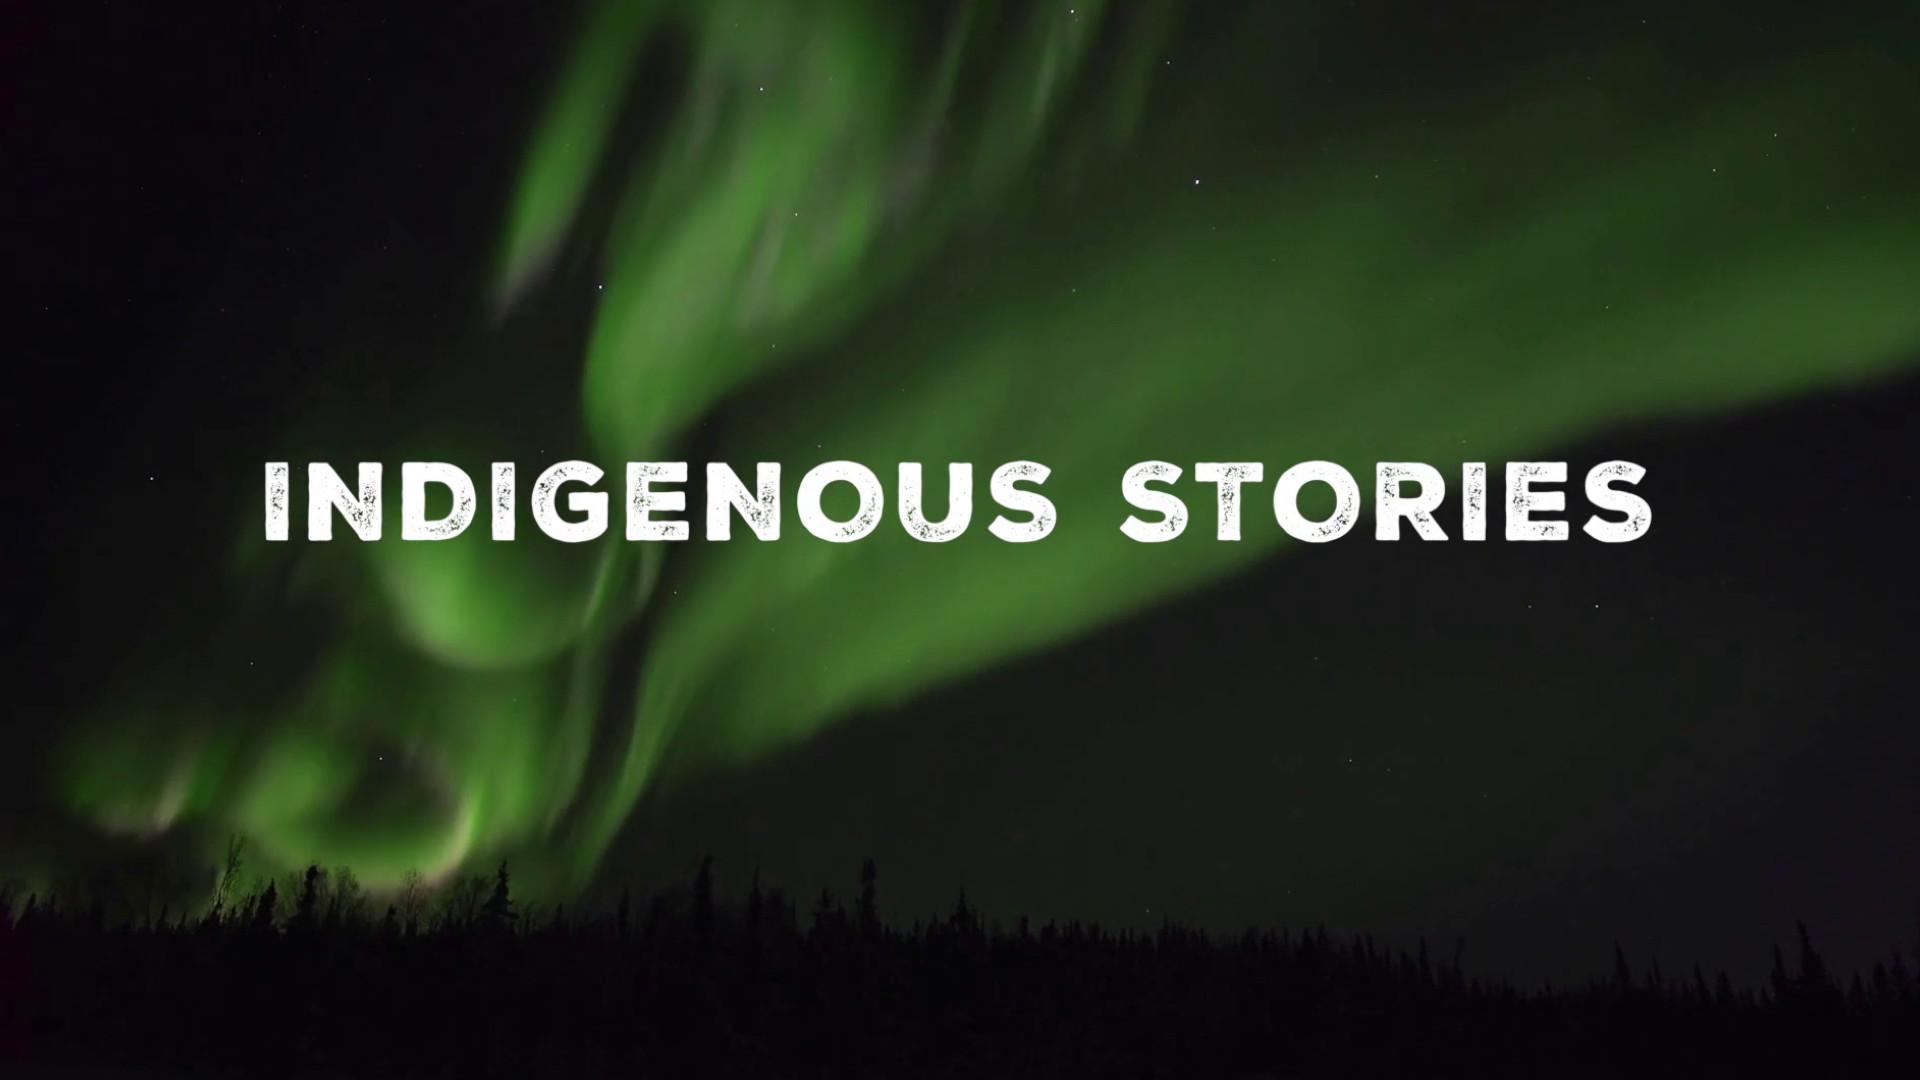 Indigenous Stories, Northwest Territories, Canada